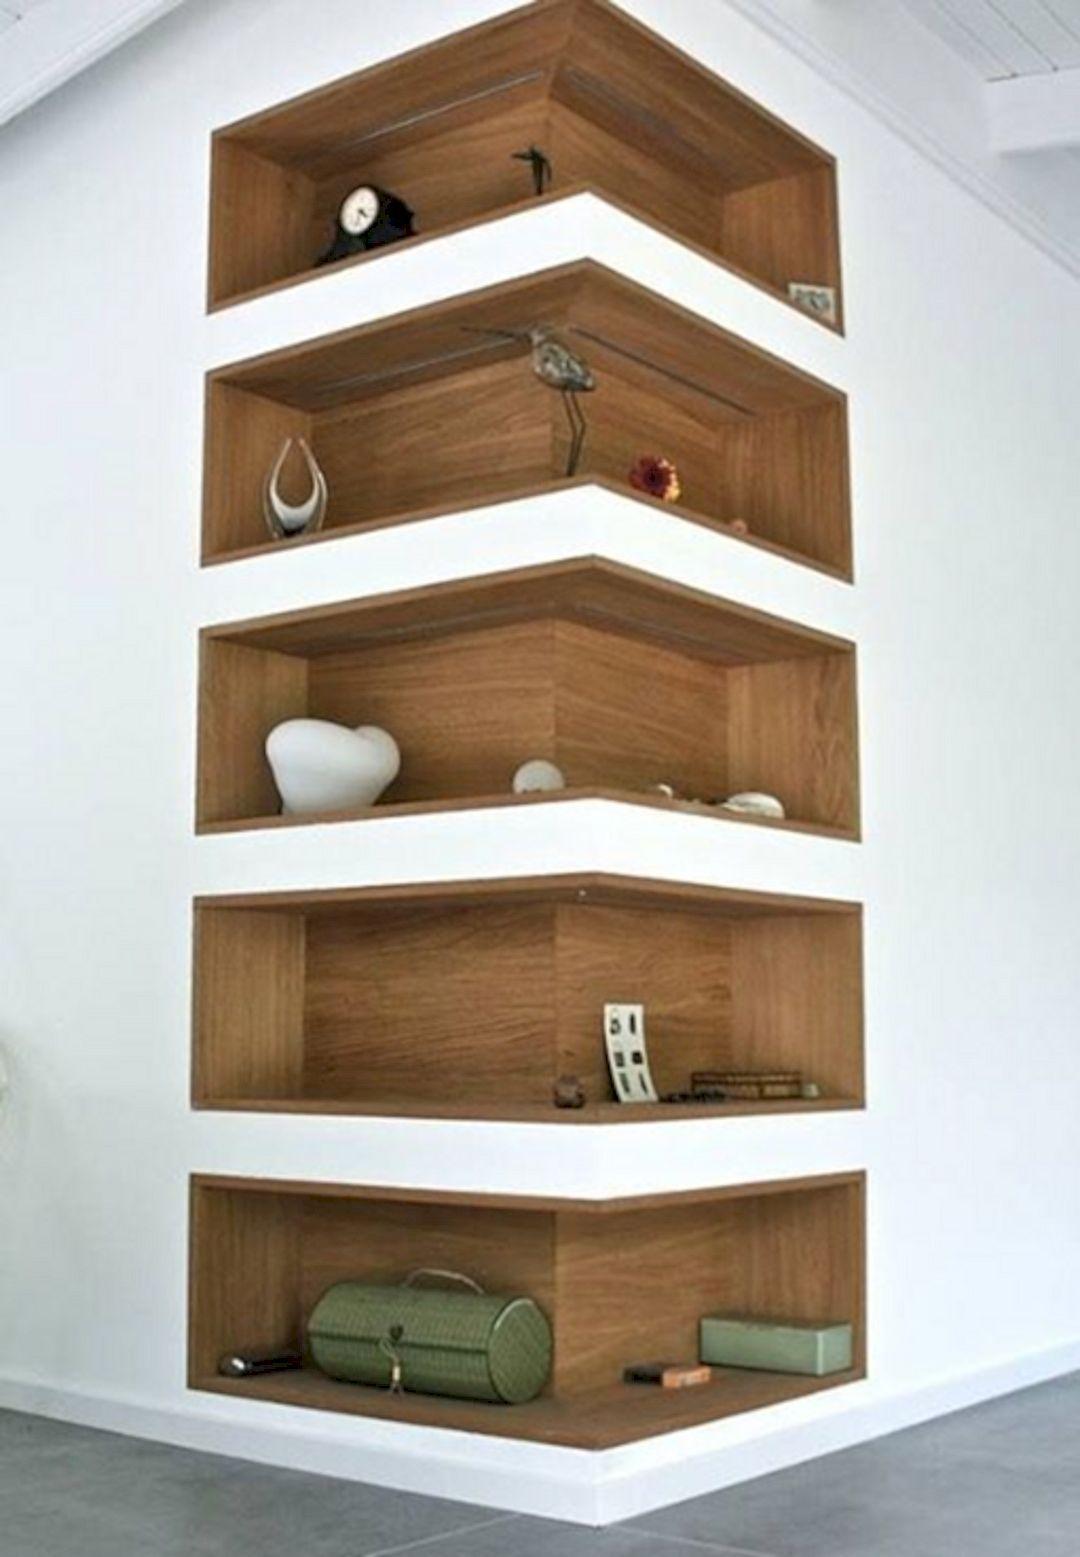 Space saving corner shelf design ideas https www futuristarchitecture com